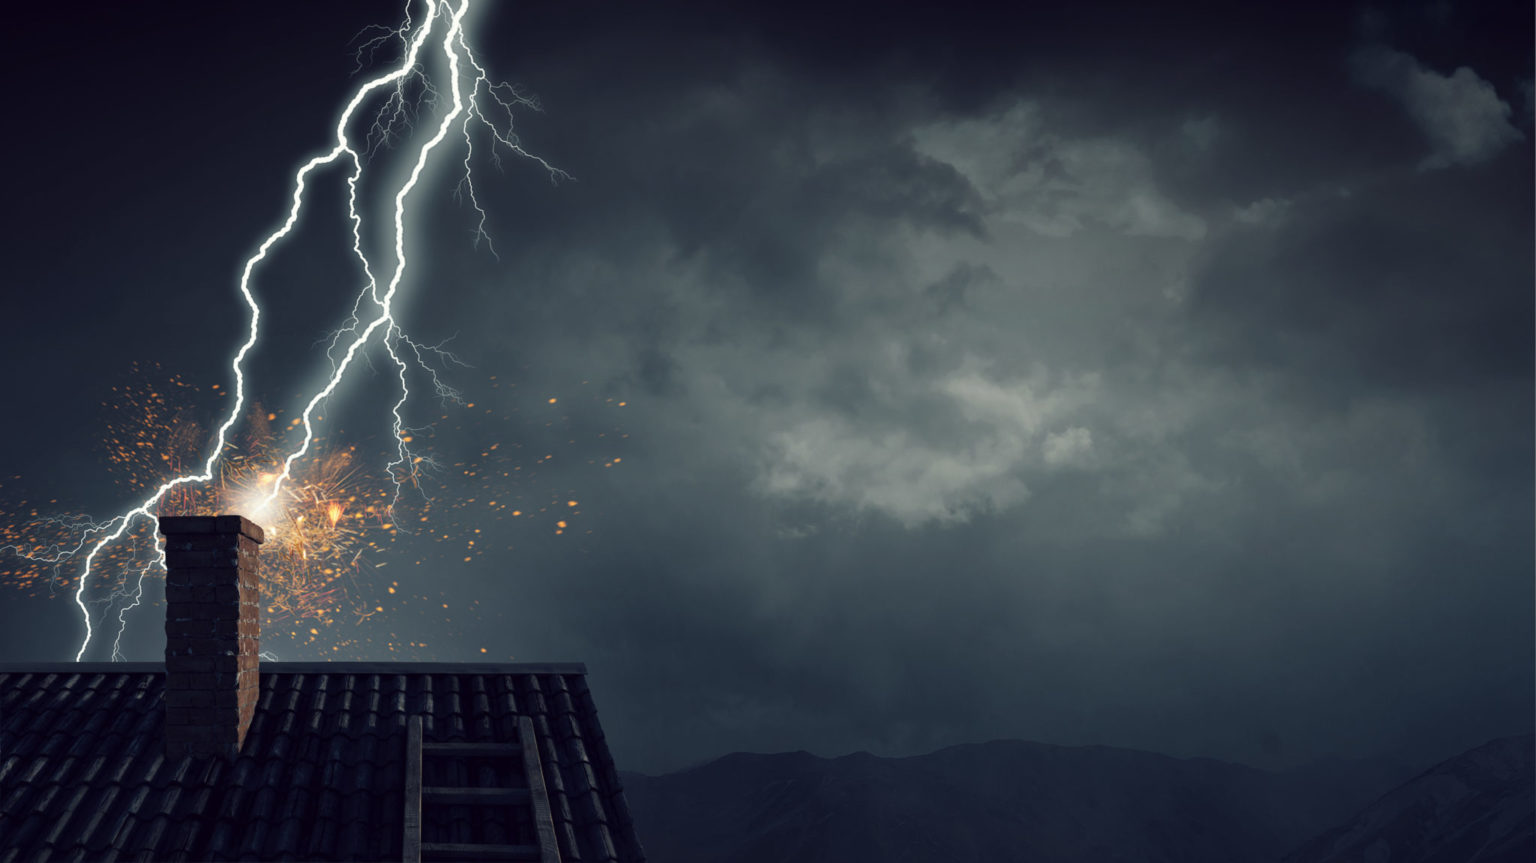 Bright lightning striking roof of house.